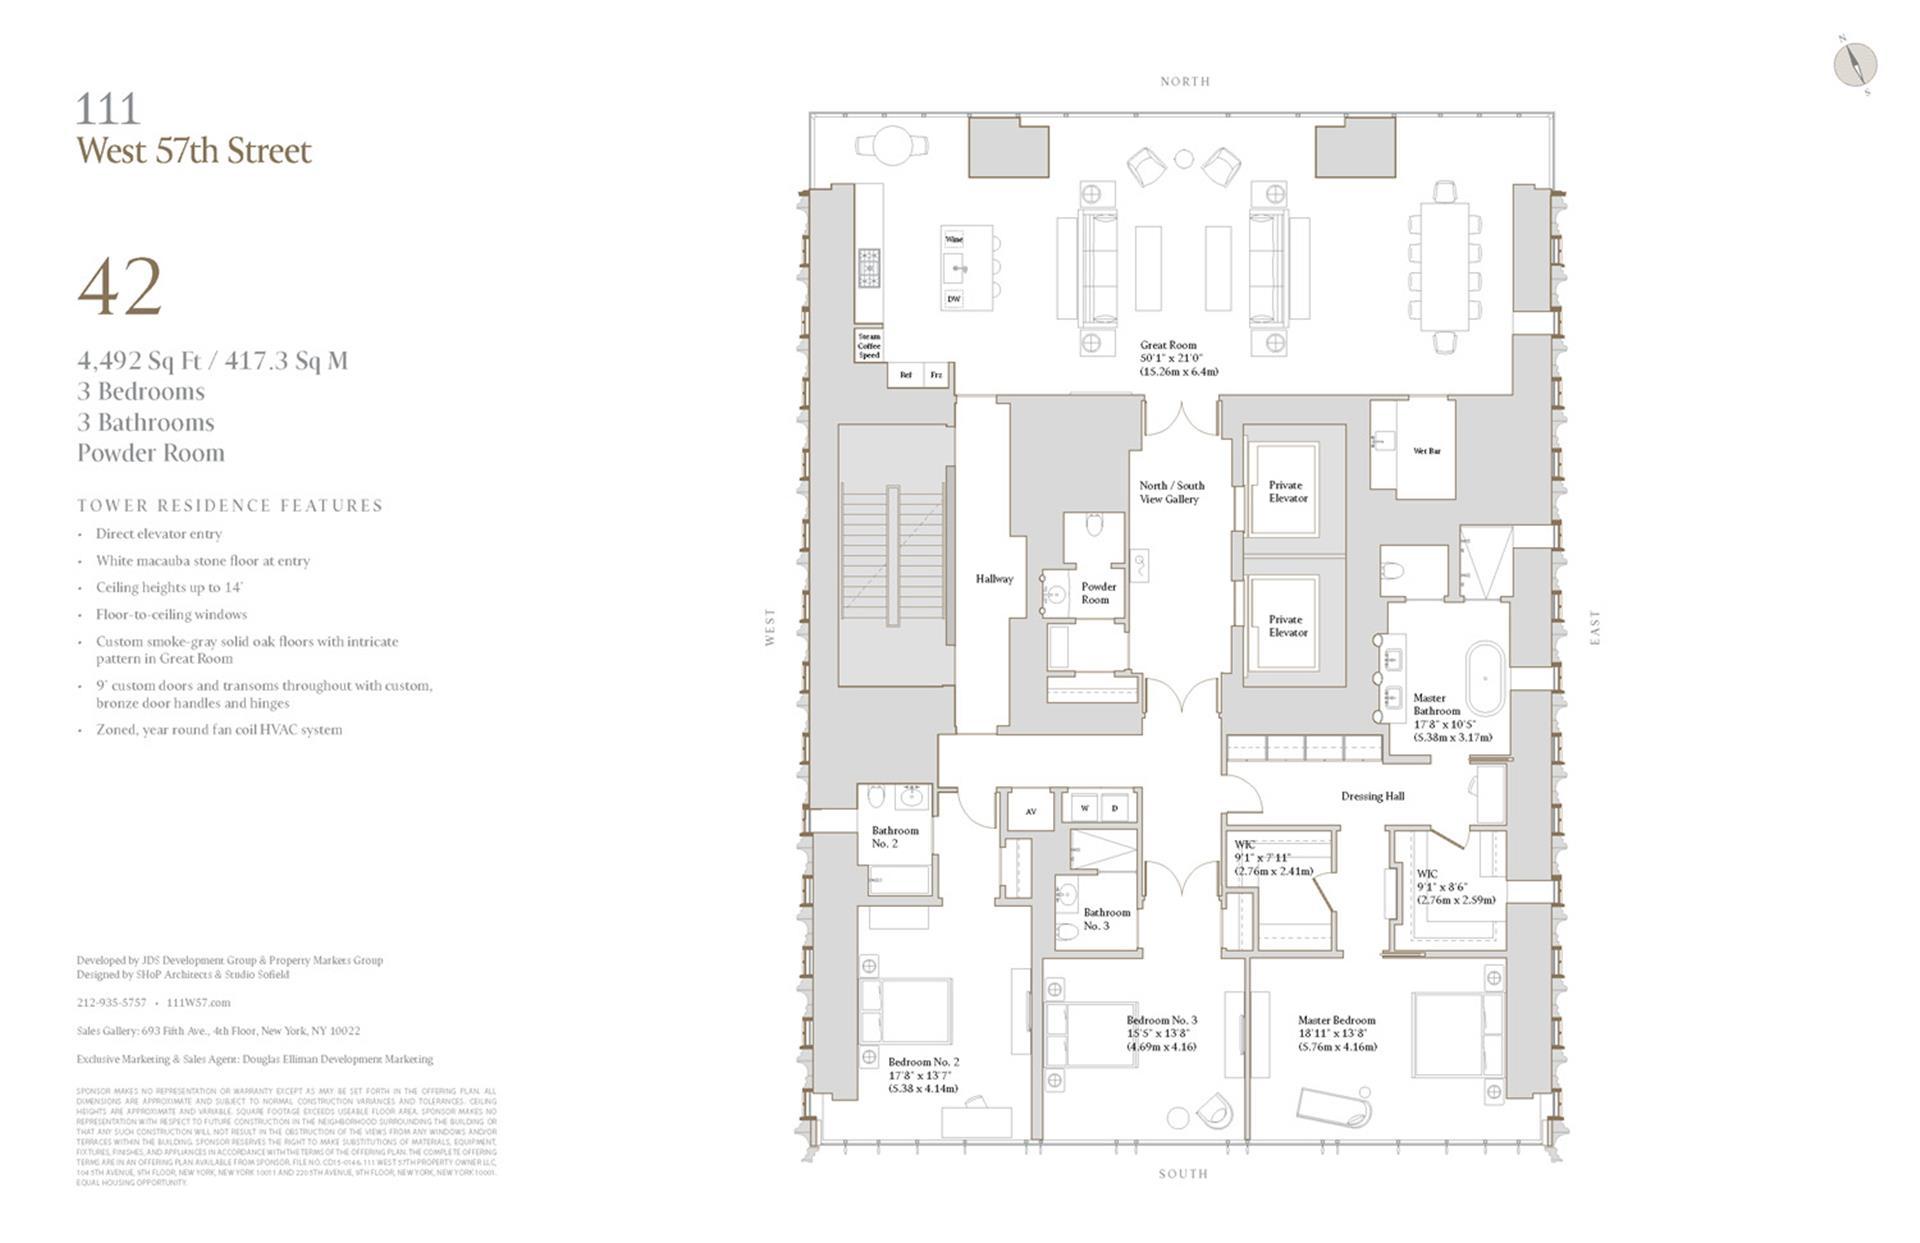 Floor plan of 111 West 57th Street, 42